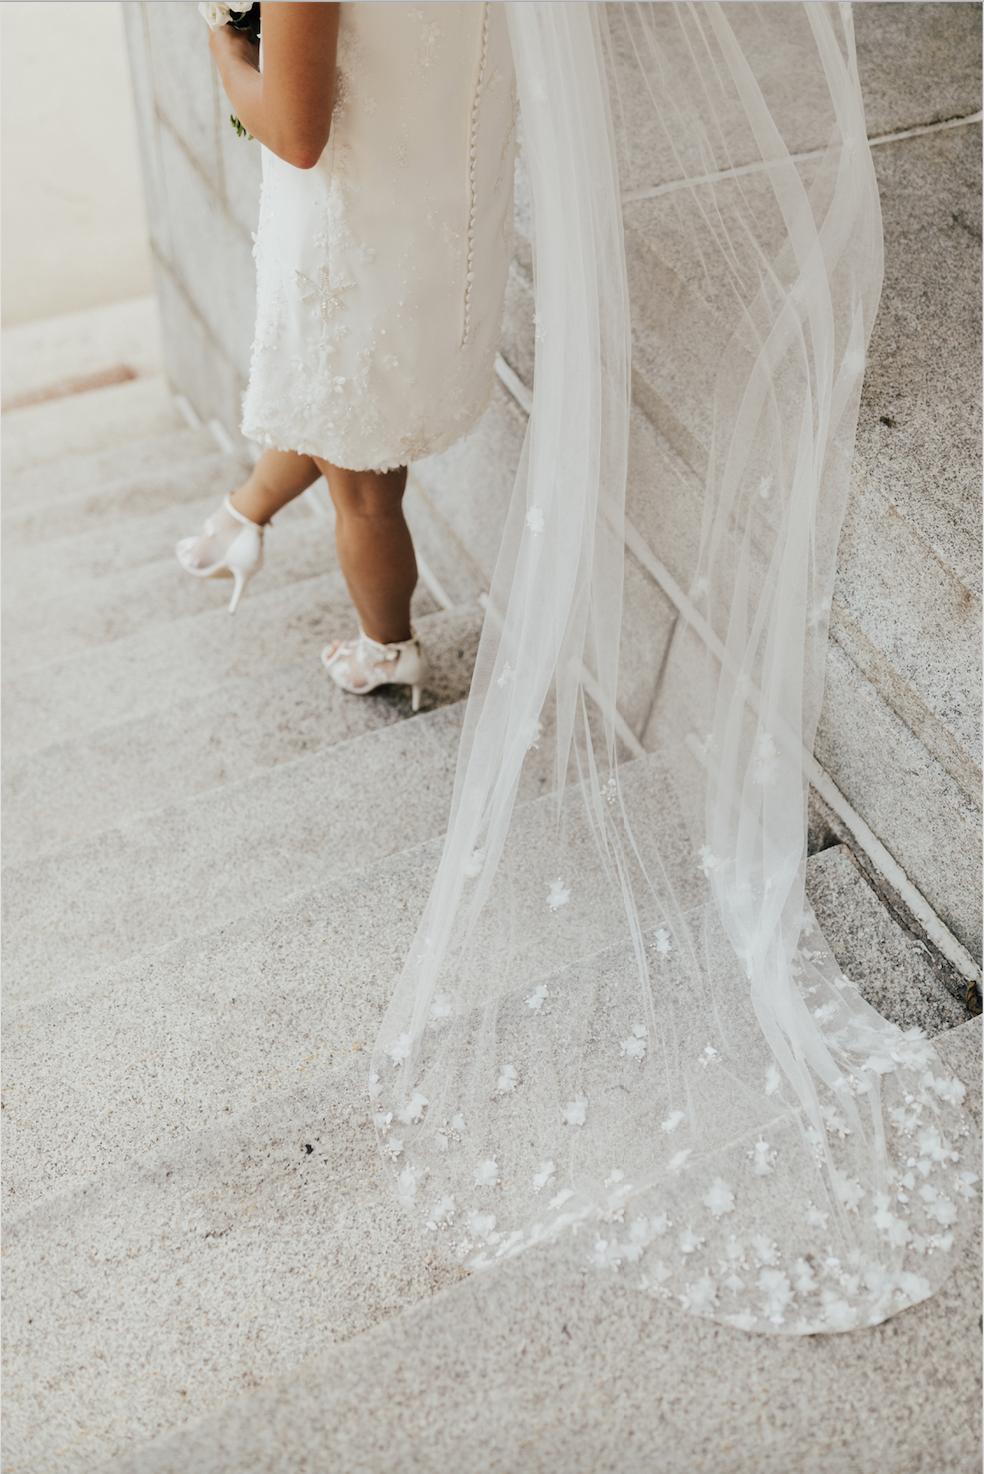 Floating Flowers Veil From Bhldn Photographer Christyljohnston Bride Torimasters Short Wedding Dress Wedding Dress With Veil Wedding Dress Outfit [ 1474 x 984 Pixel ]